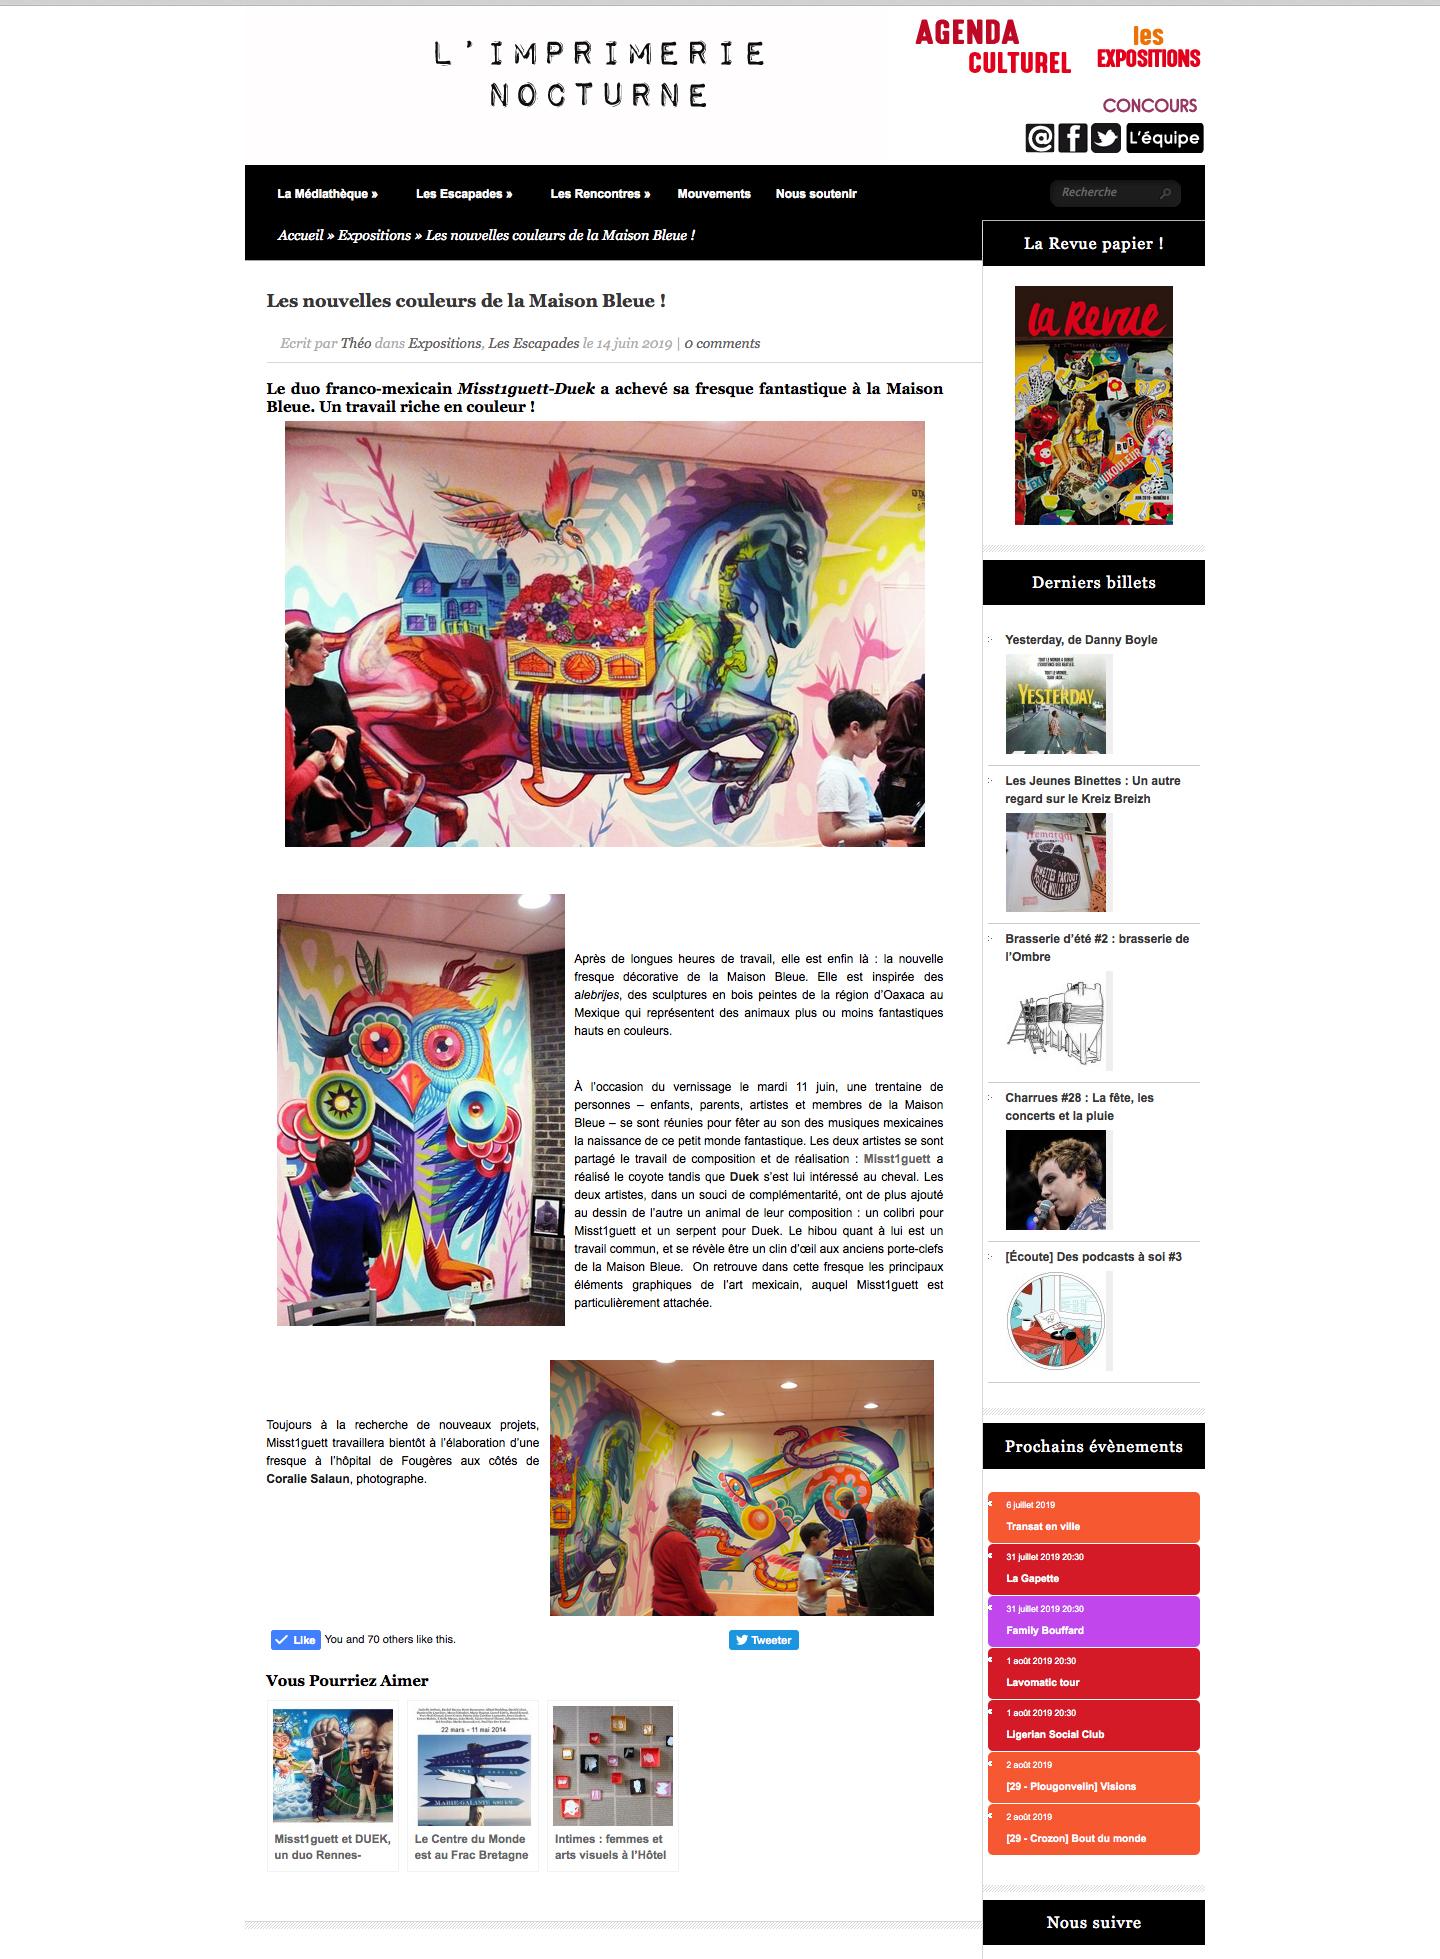 article casa azul 14 juin 2019 l imprimerie nocturne-theo